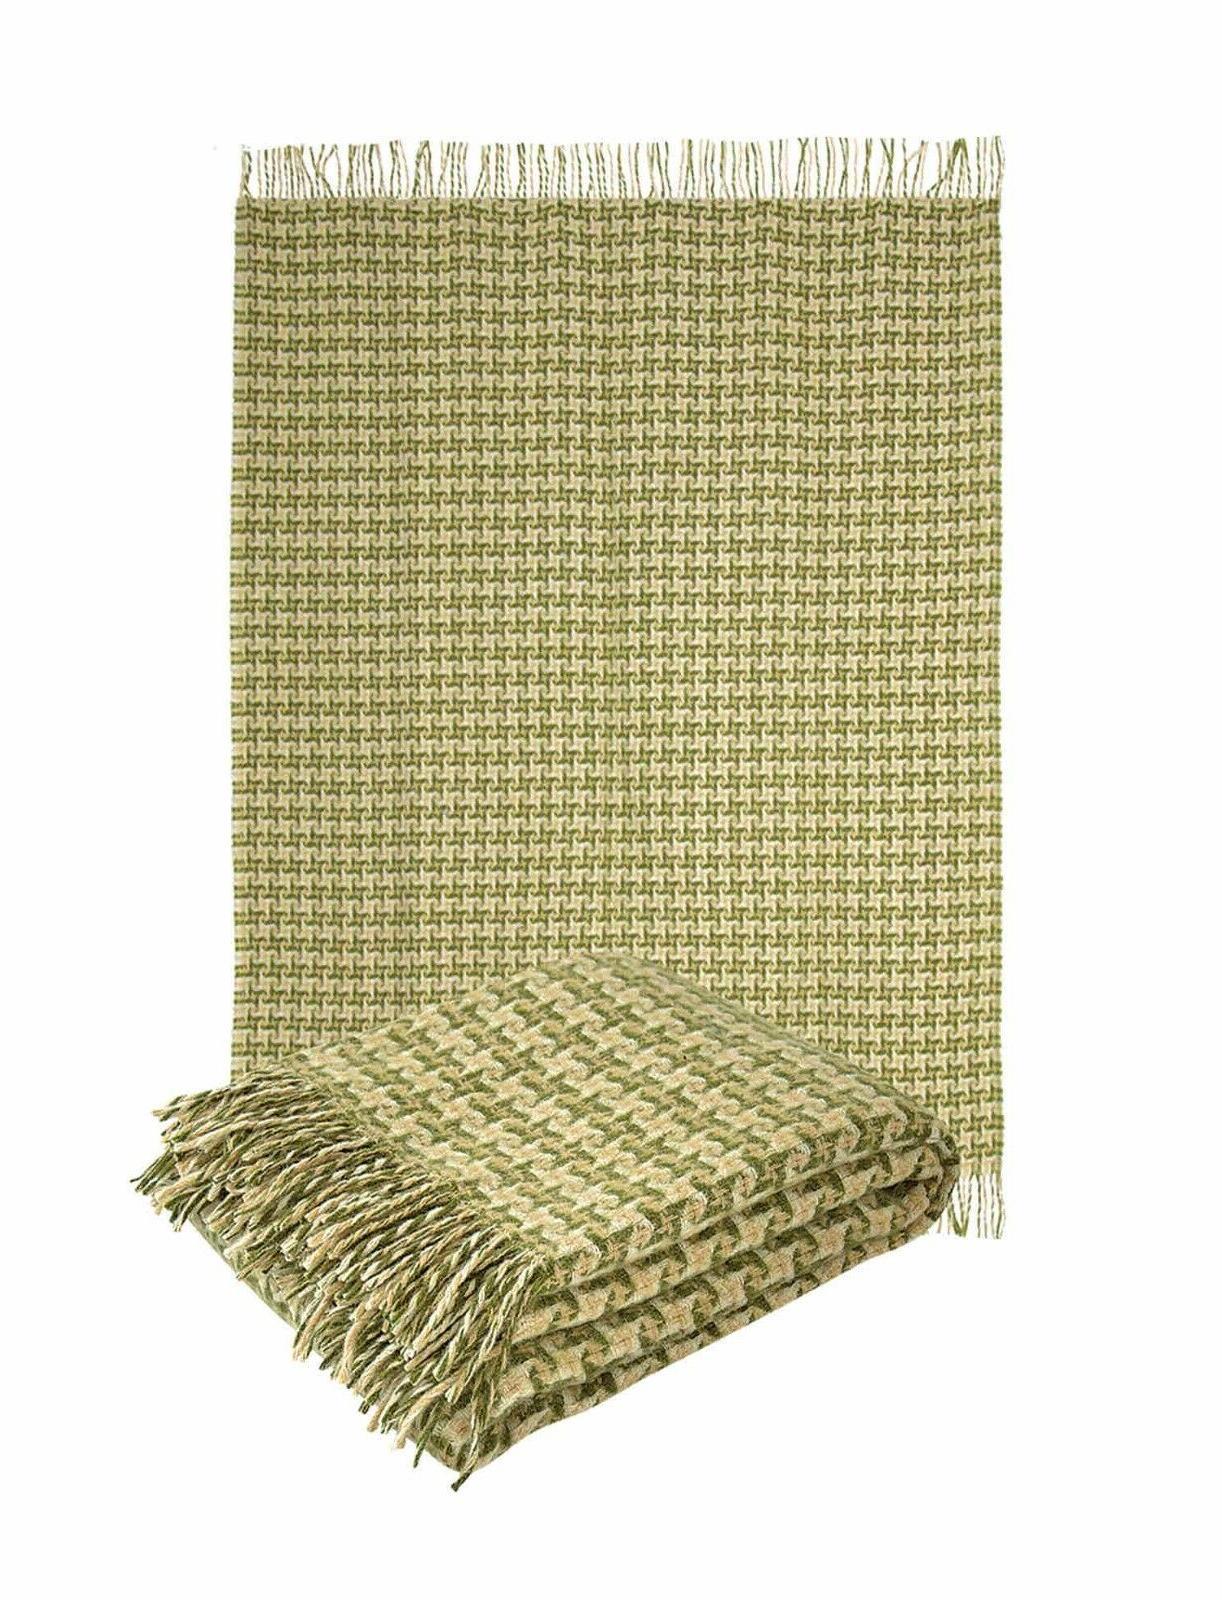 "100% New Sheep Wool Throw Blanket fringe 55x79""hounds Olive"